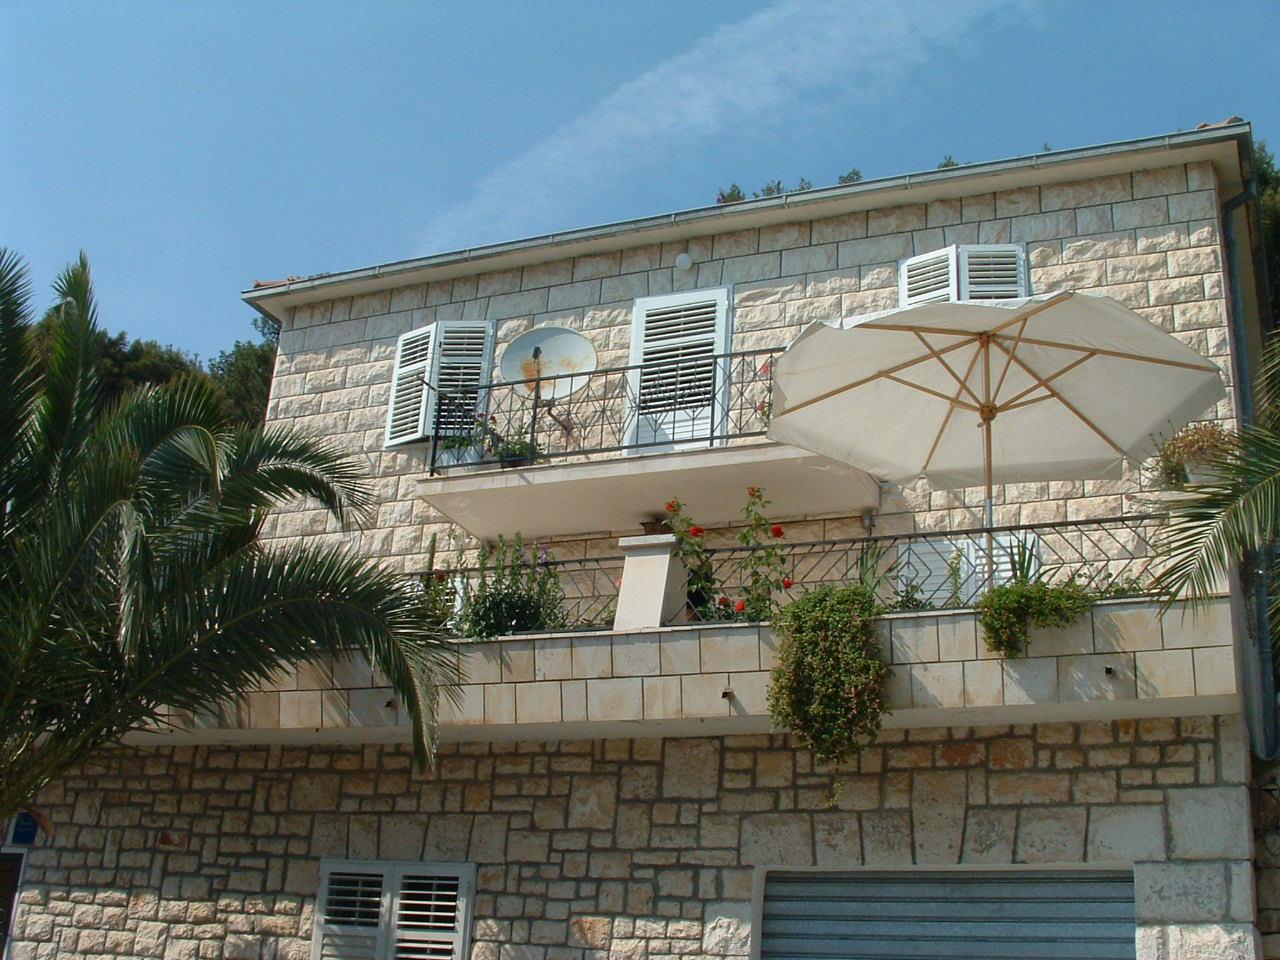 01201MILN - Milna (Brac) - Holiday houses, villas Croatia